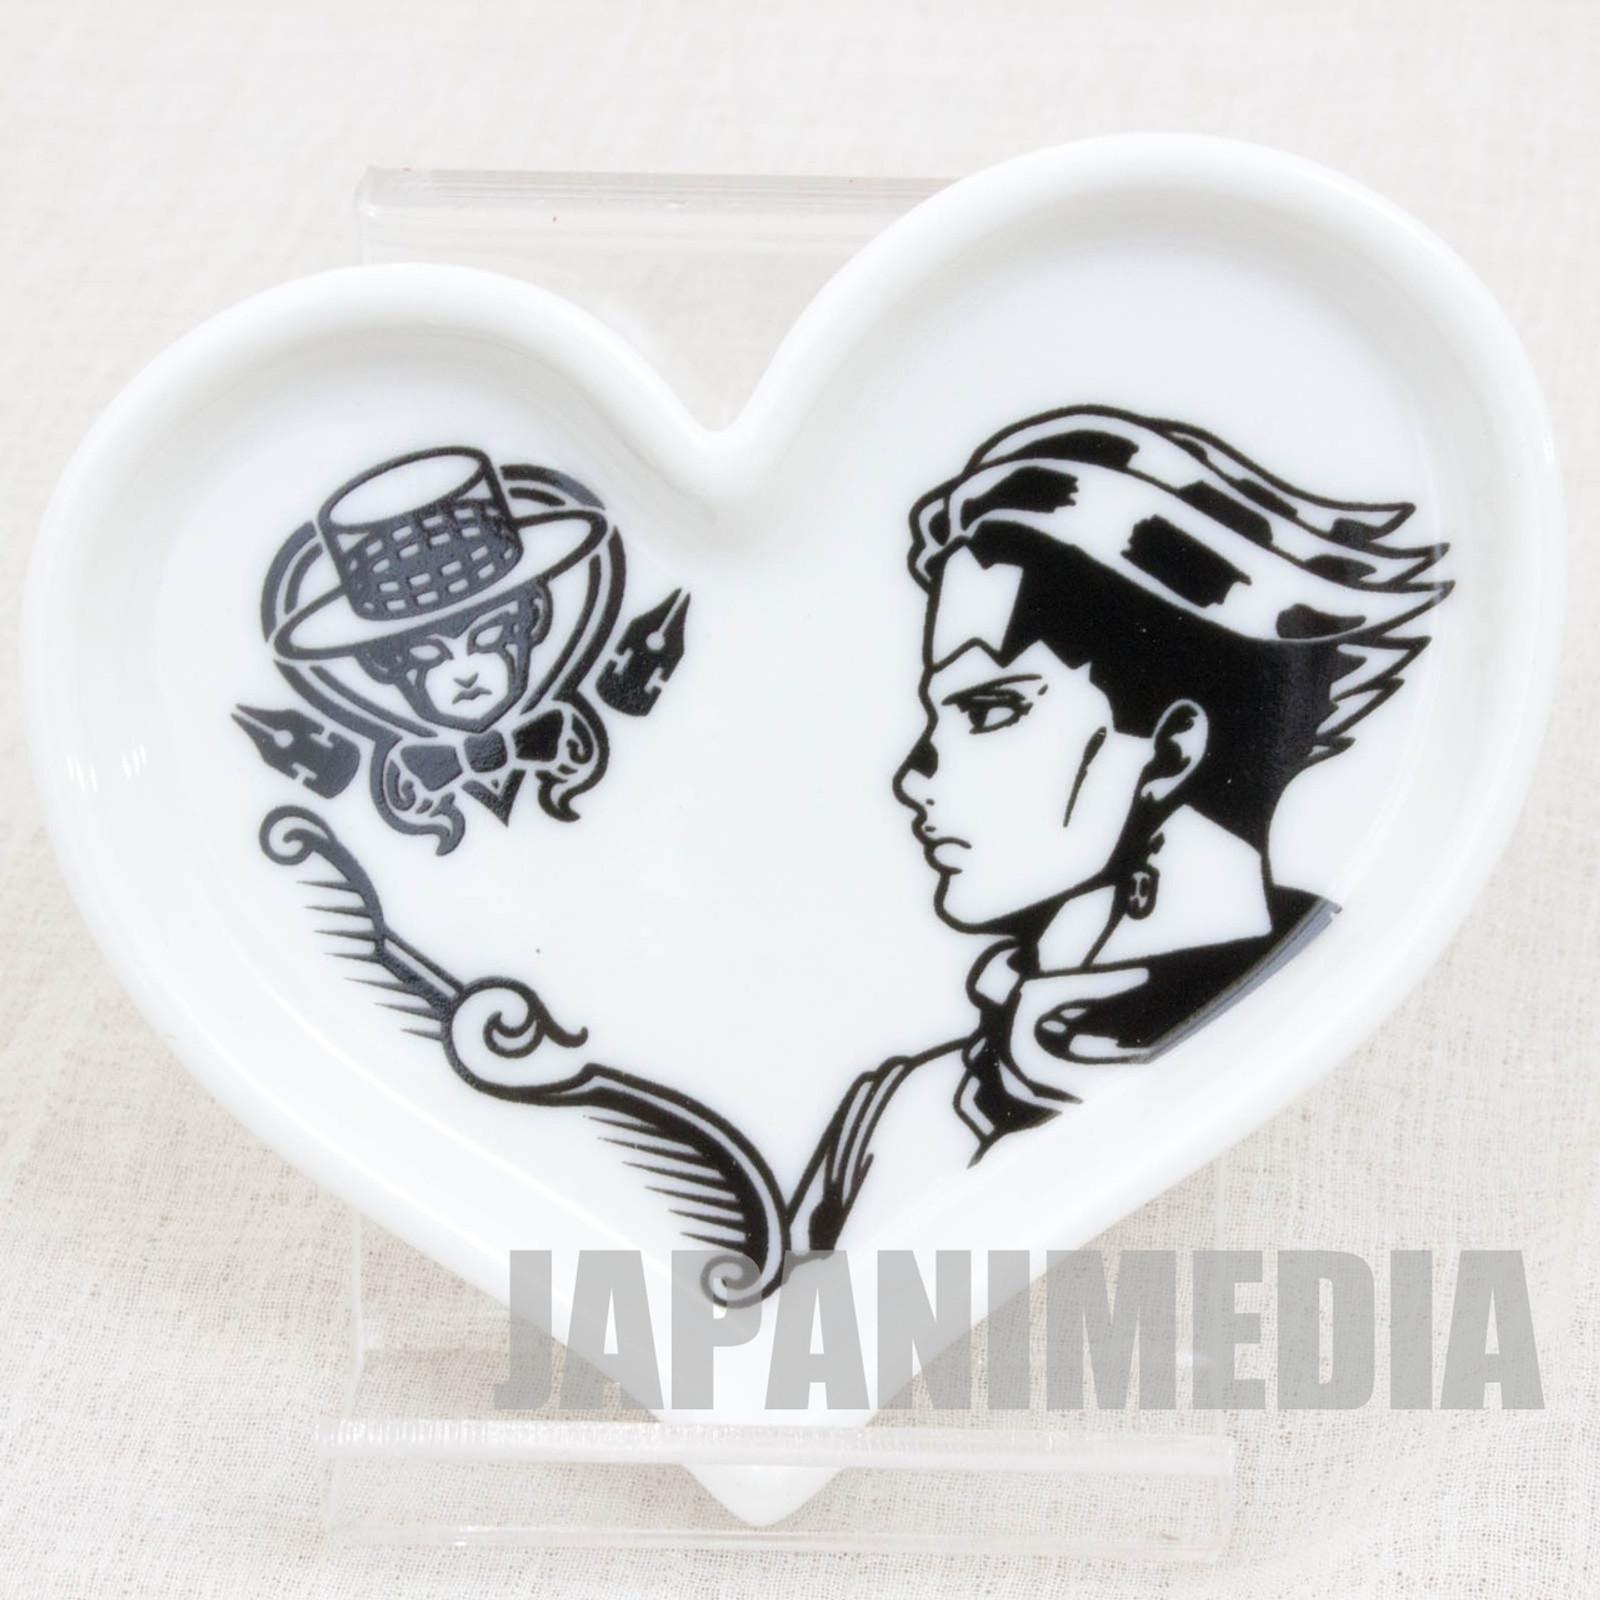 JoJo's Bizarre Adventure Diamond Is Unbreakable Kishibe Rohan Small Plate